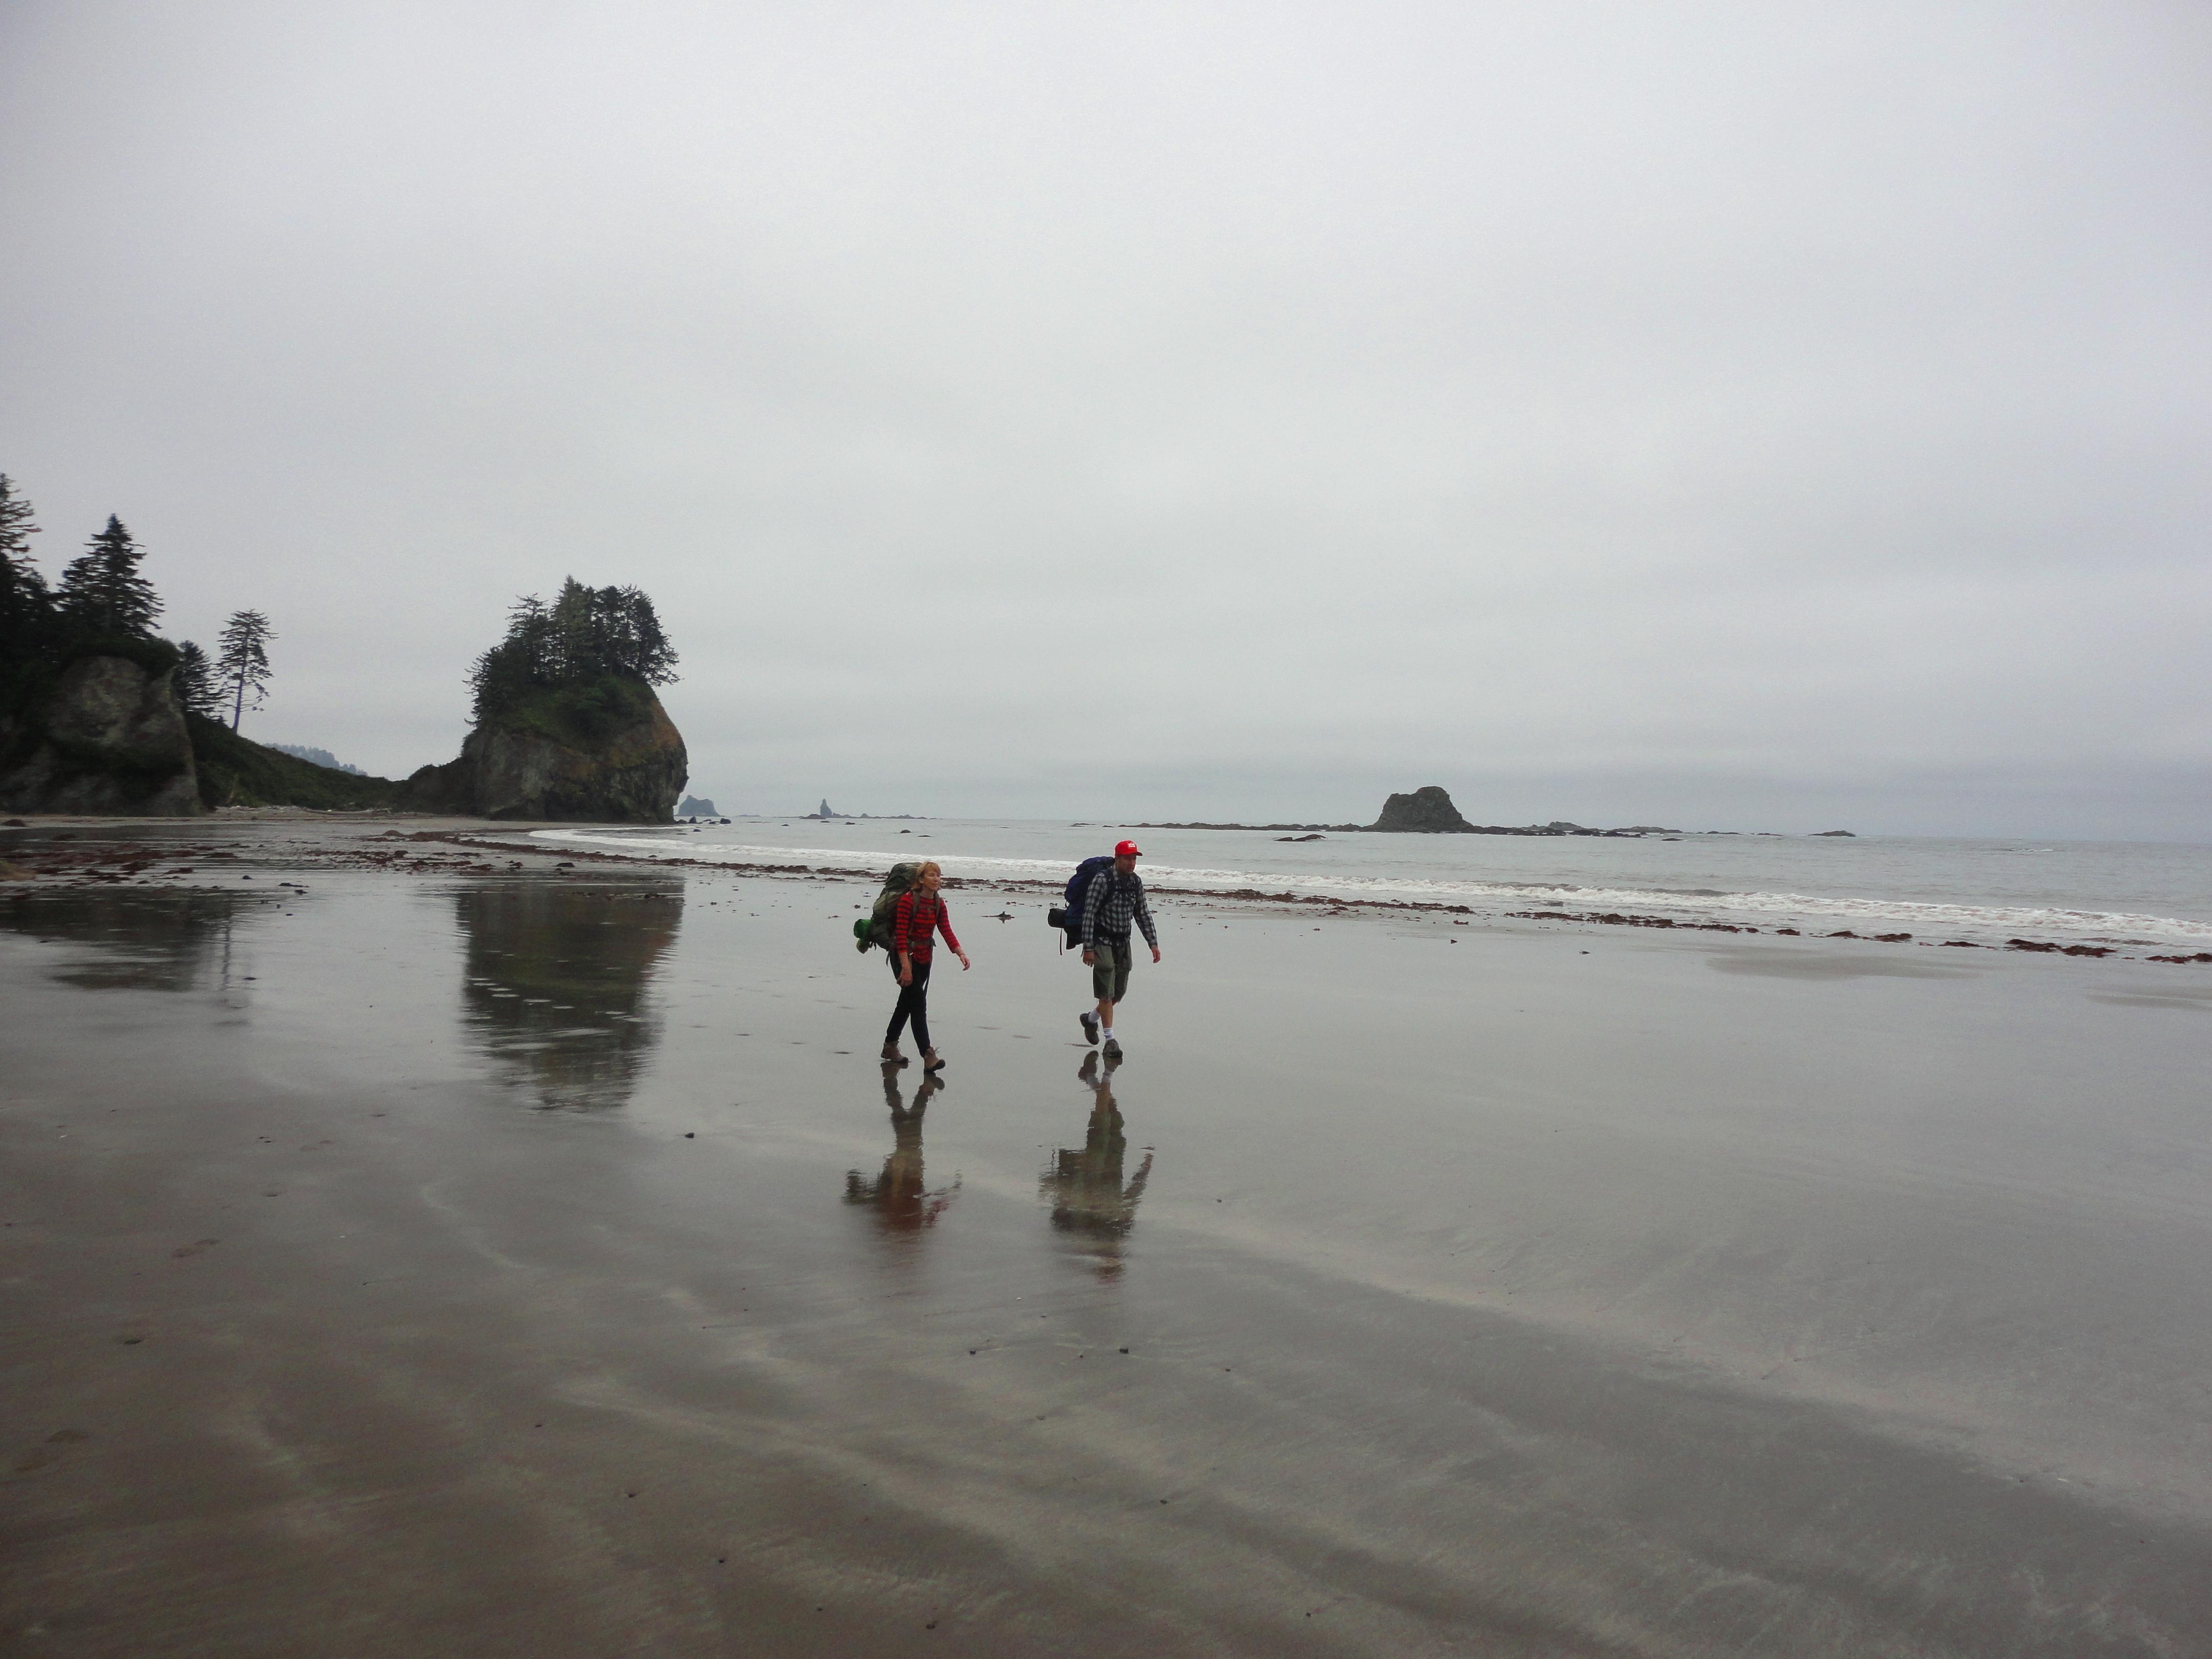 Robin and Joe by the sea, Beach, Coast, Landscape, Outdoor, HQ Photo